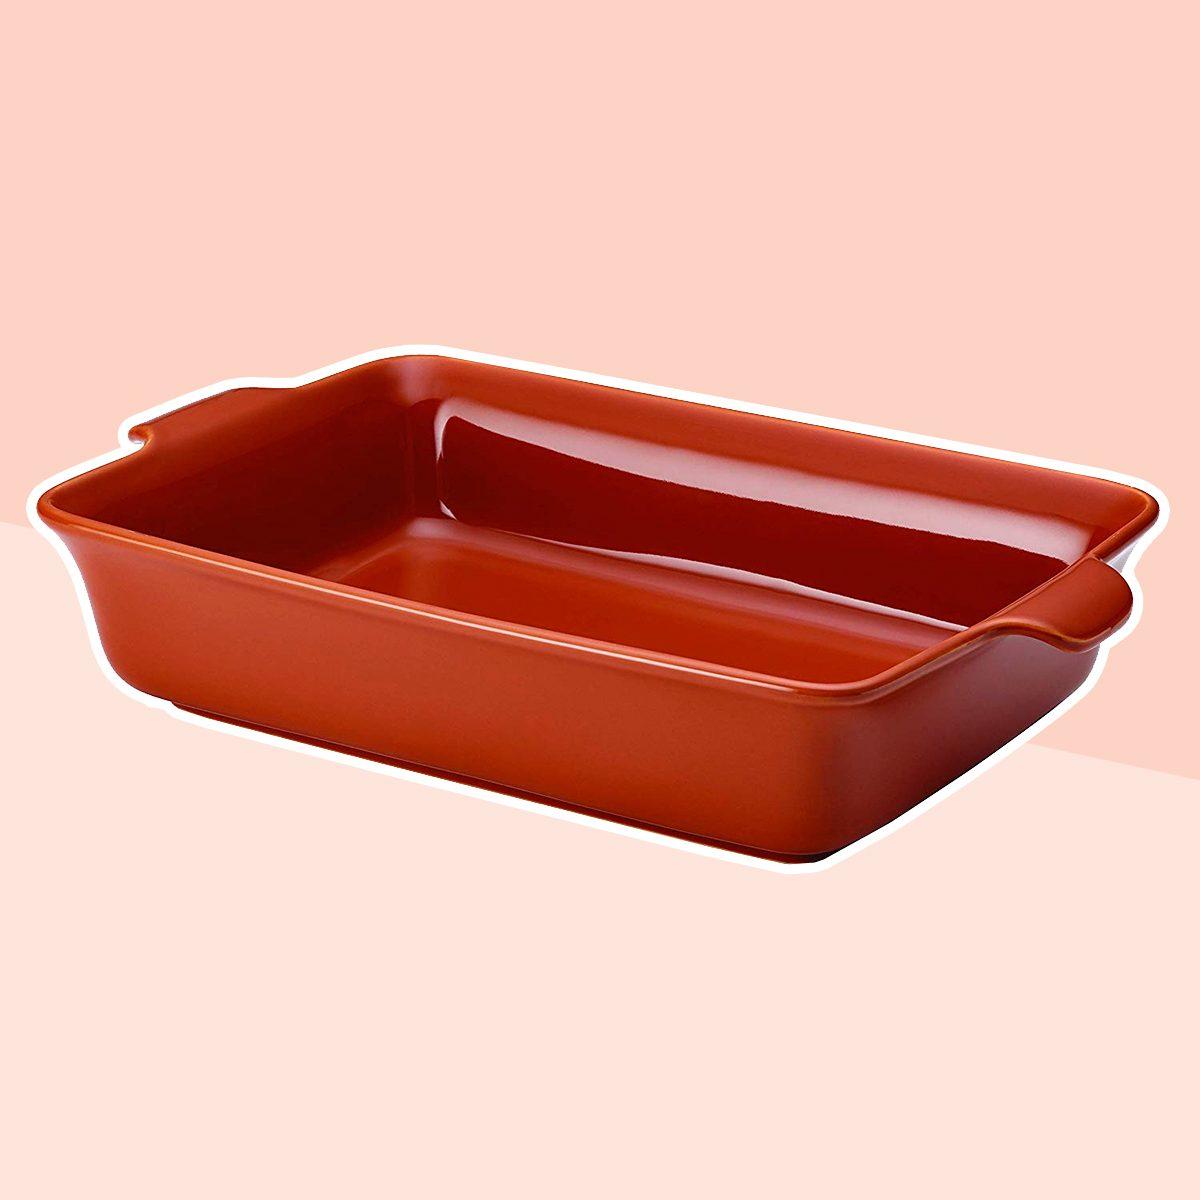 Anolon Vesta Ceramics 9-Inch x 13-Inch Rectangular Baker, Persimmon Orange